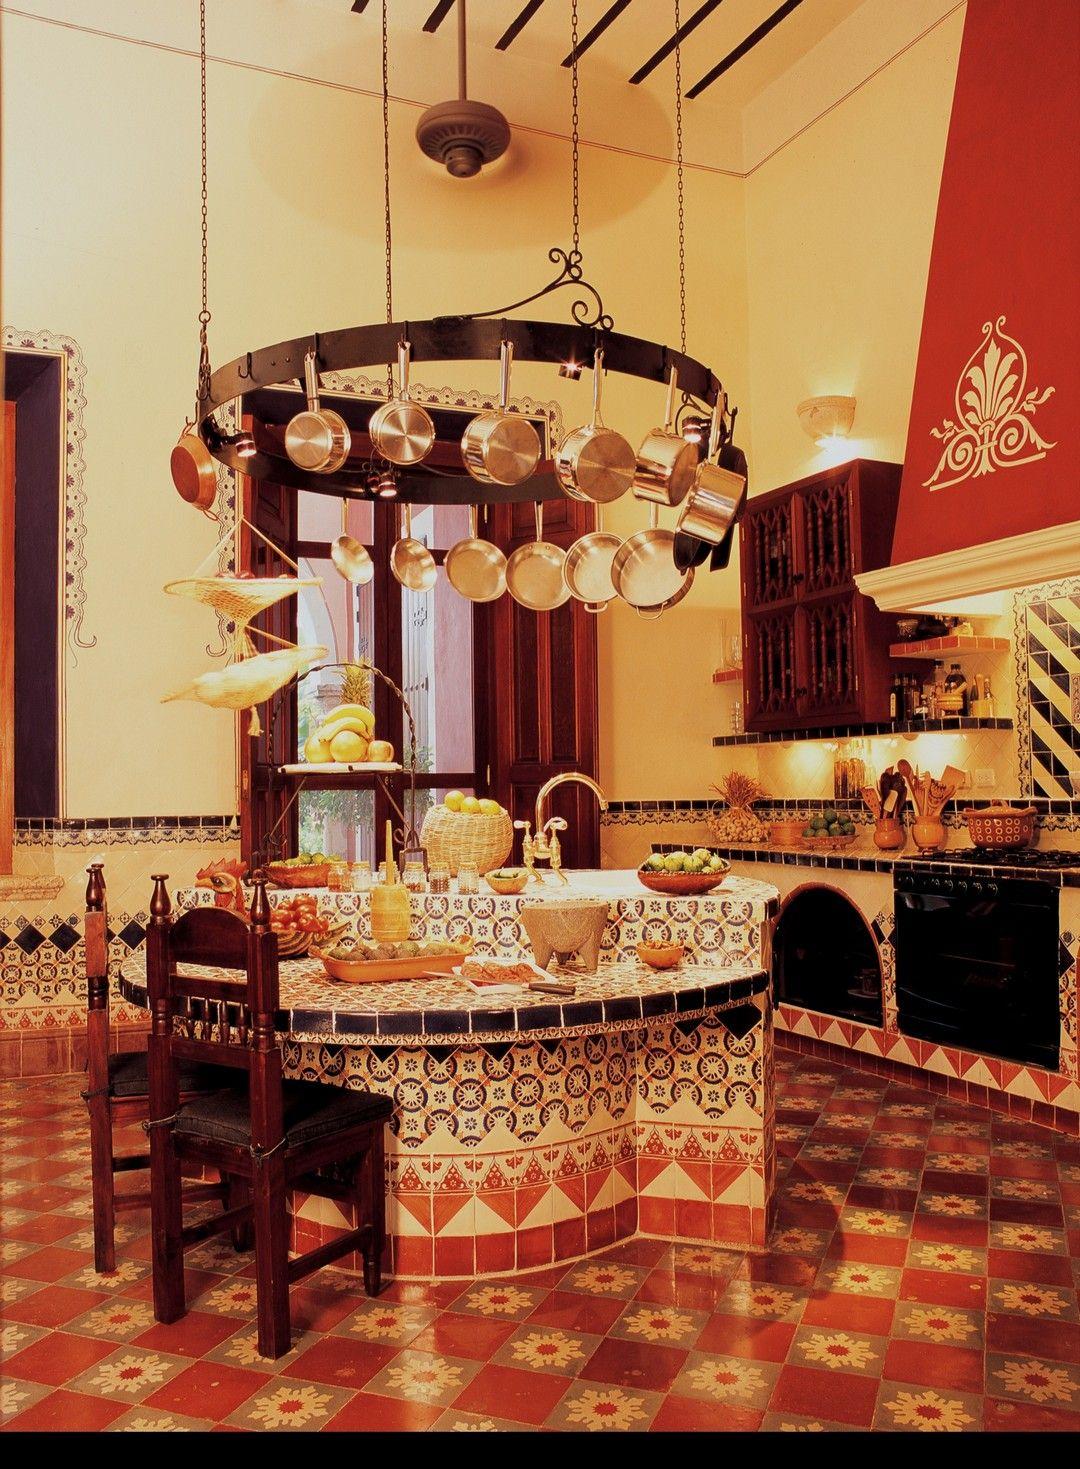 Spanish tile kitchen decorating ideas gorgeous photos spanish